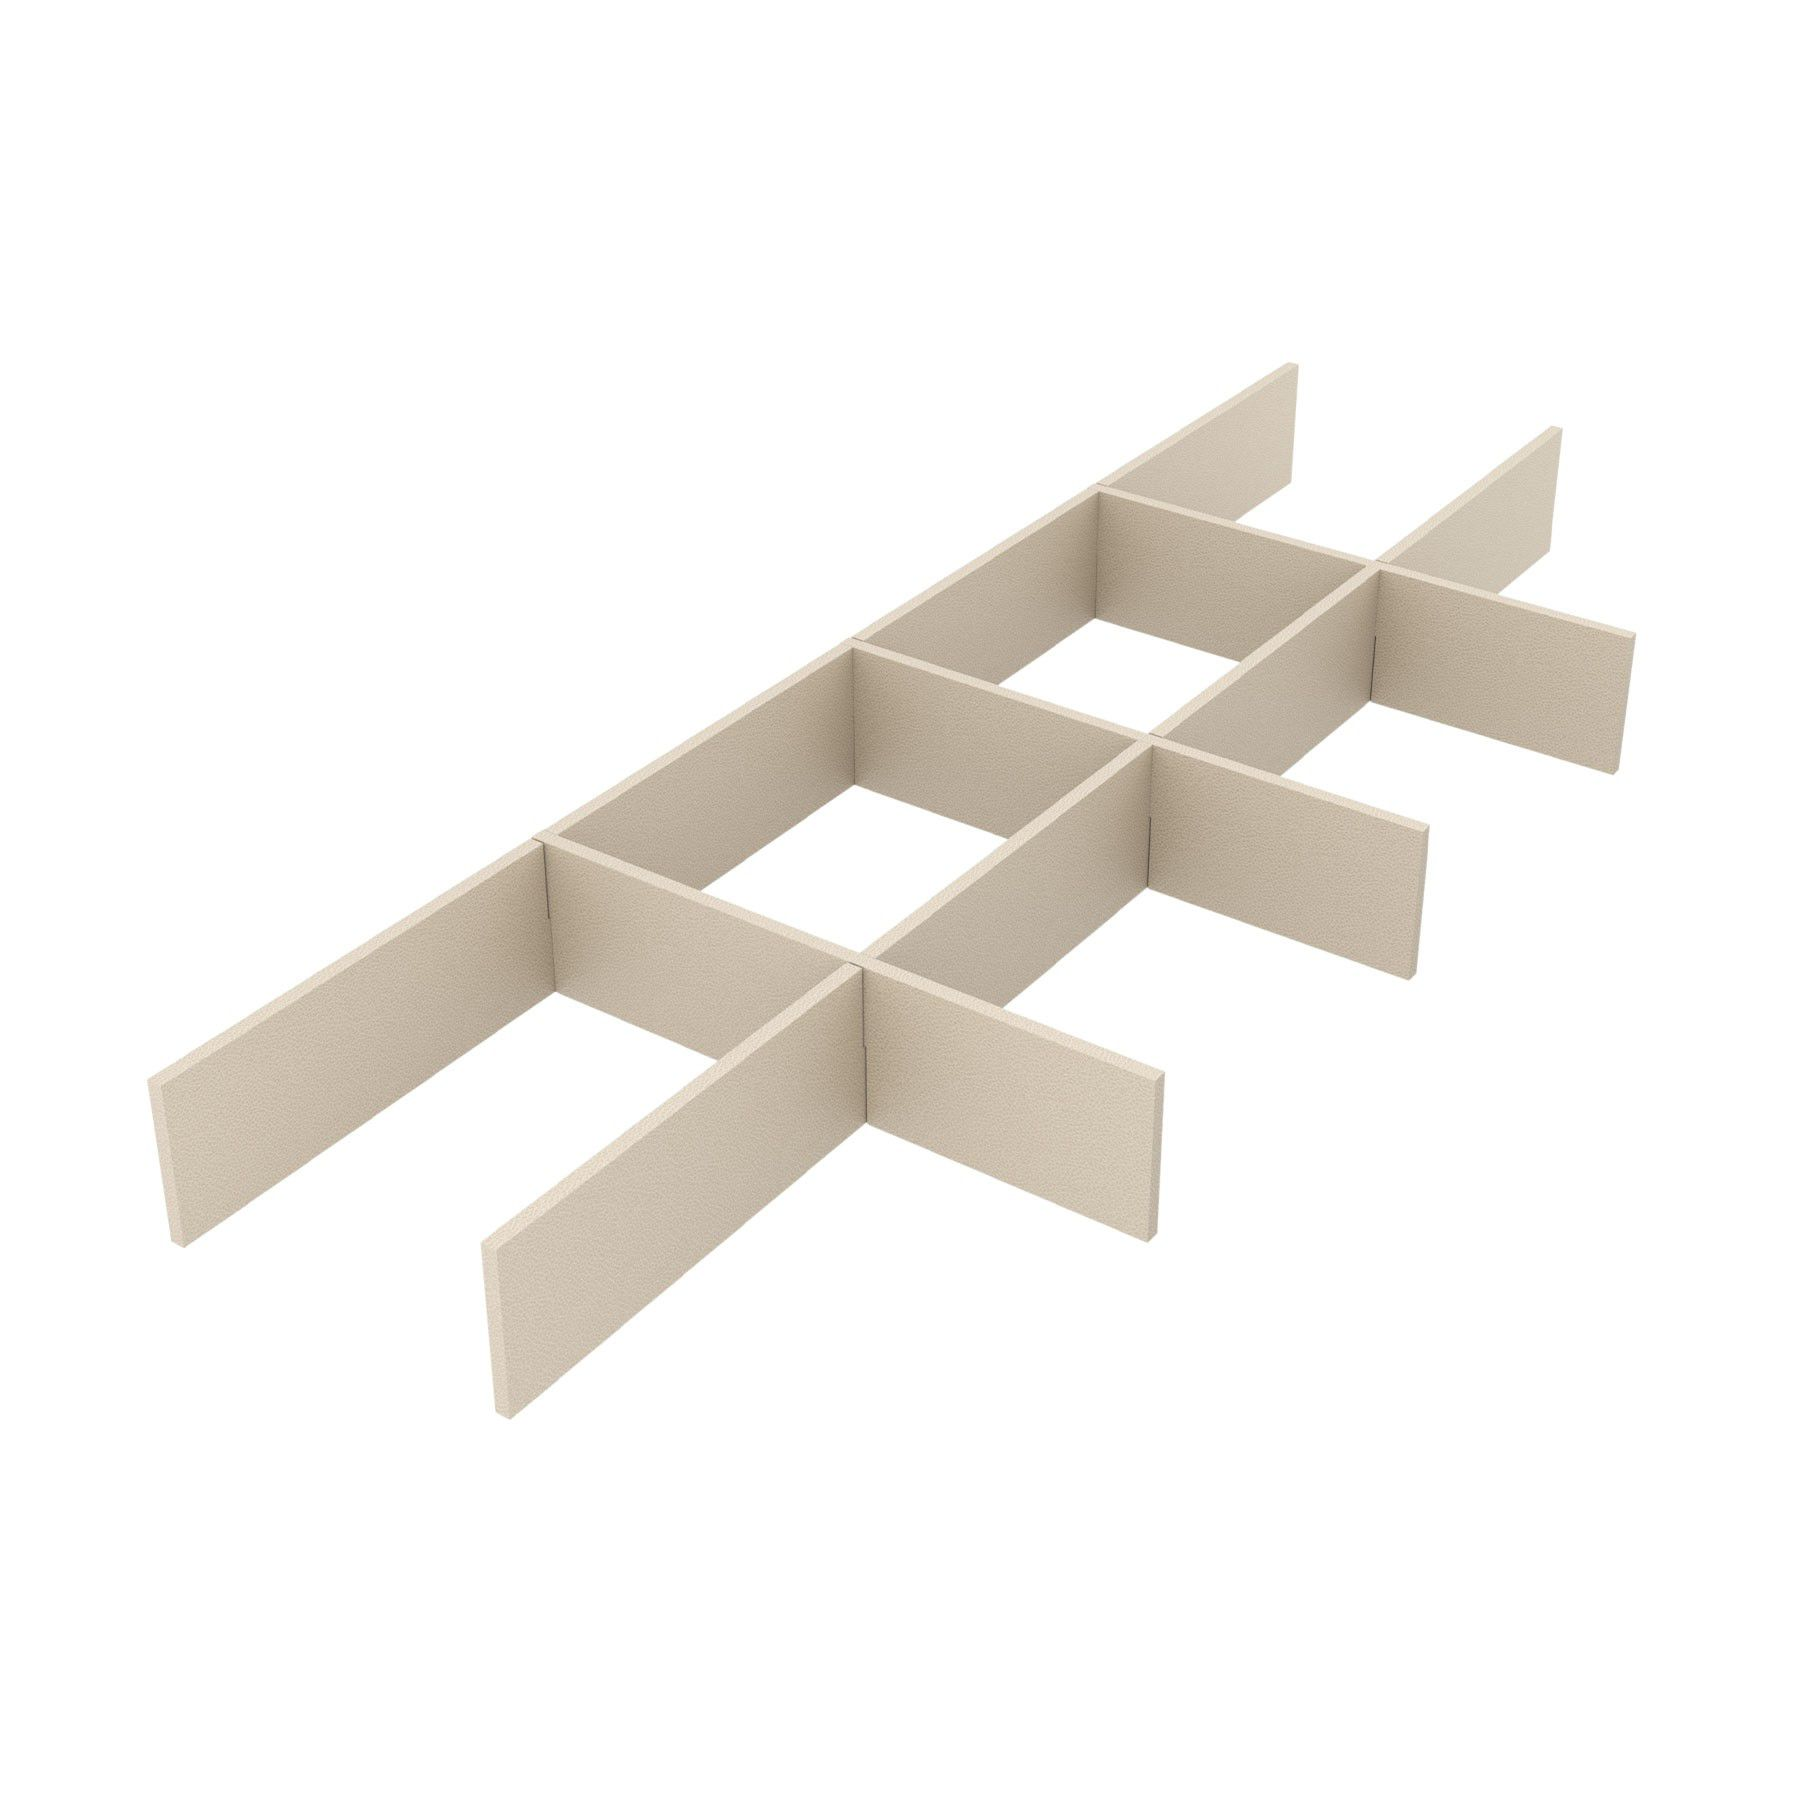 separateur tiroir inferieur pour meubles 1000 noja arenys salgar ref 85232